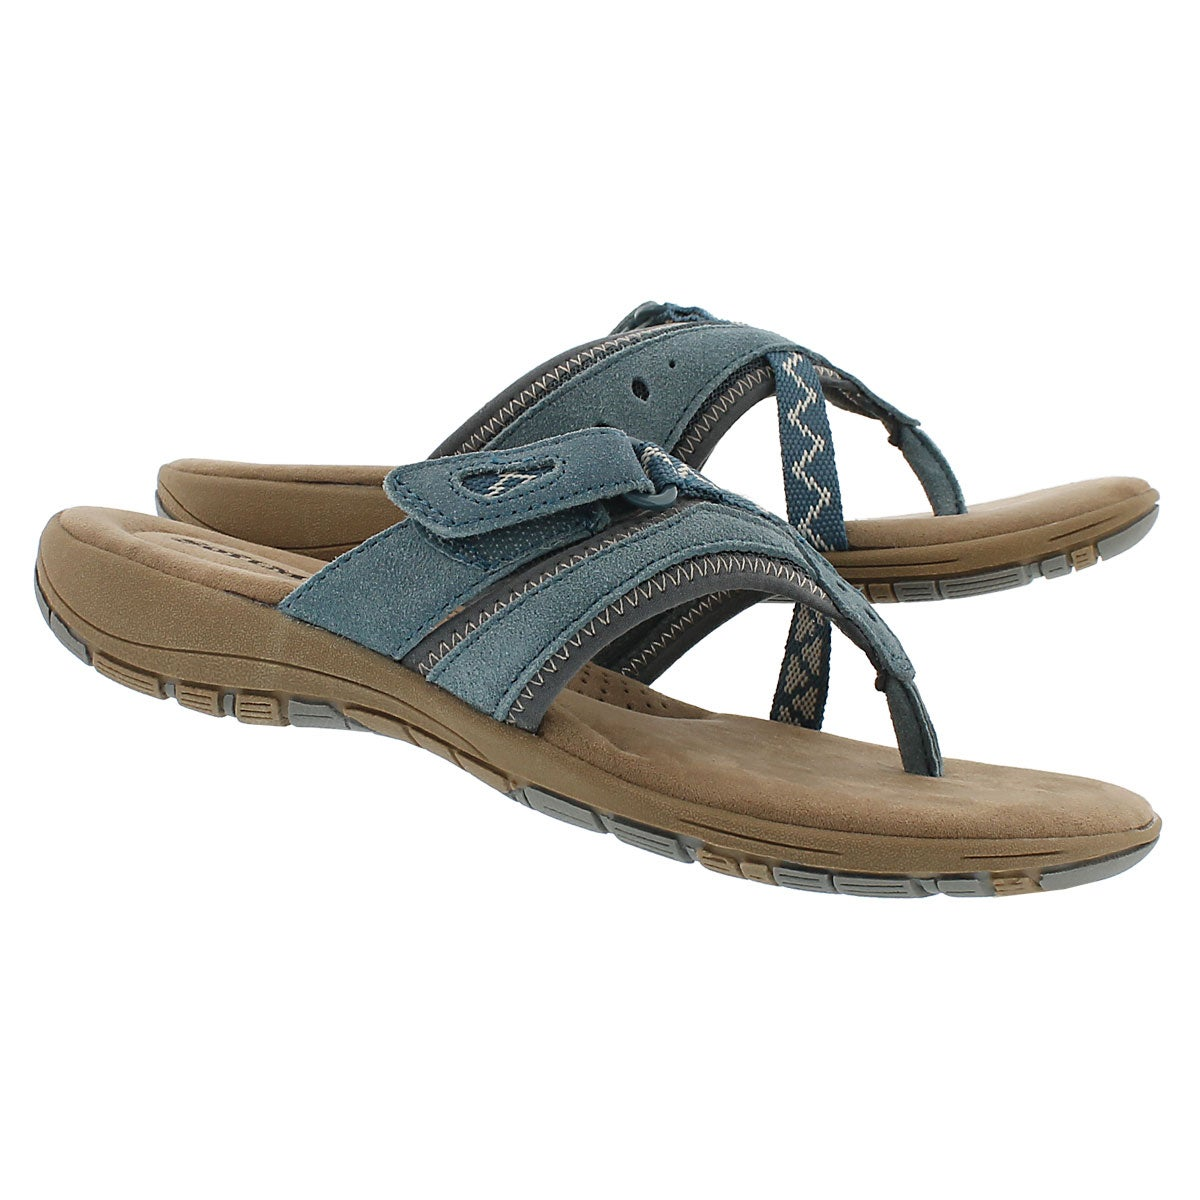 Lds Glenda blue mem. foam thong sandal